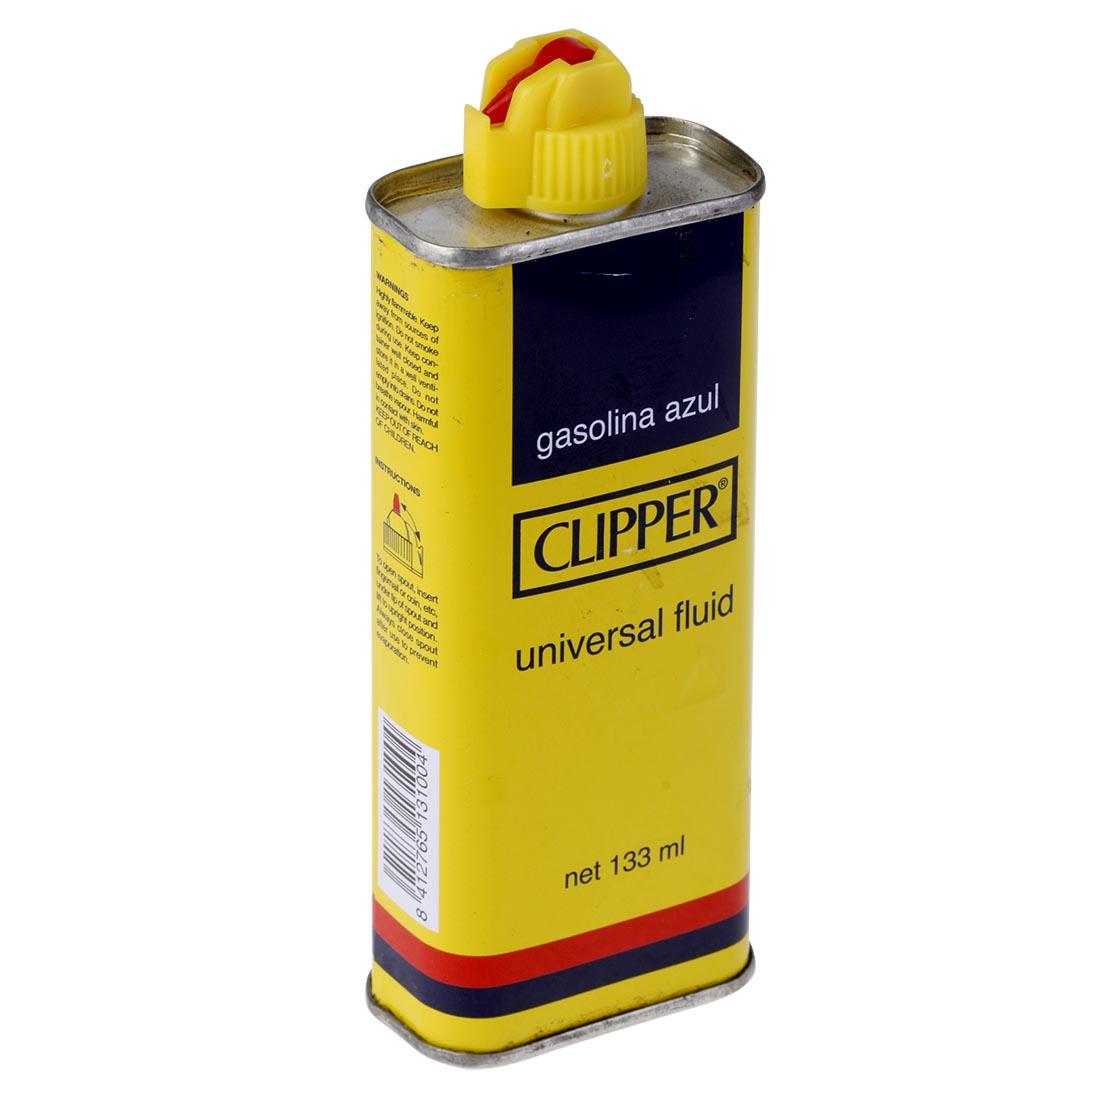 essence clipper